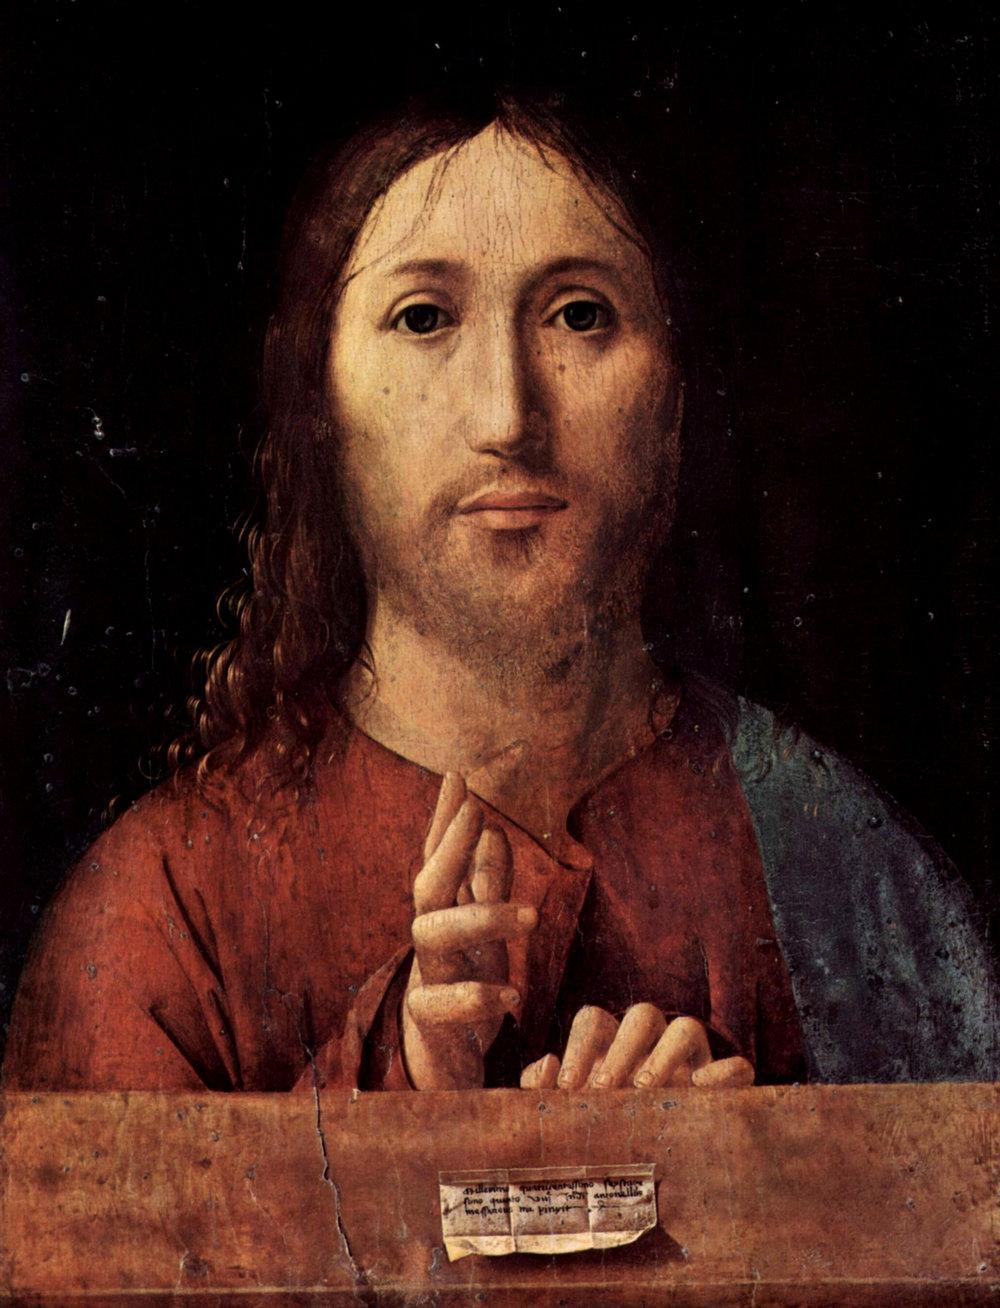 Antonello de Messina (1430),  Salvator Mundi (Savior of the World)